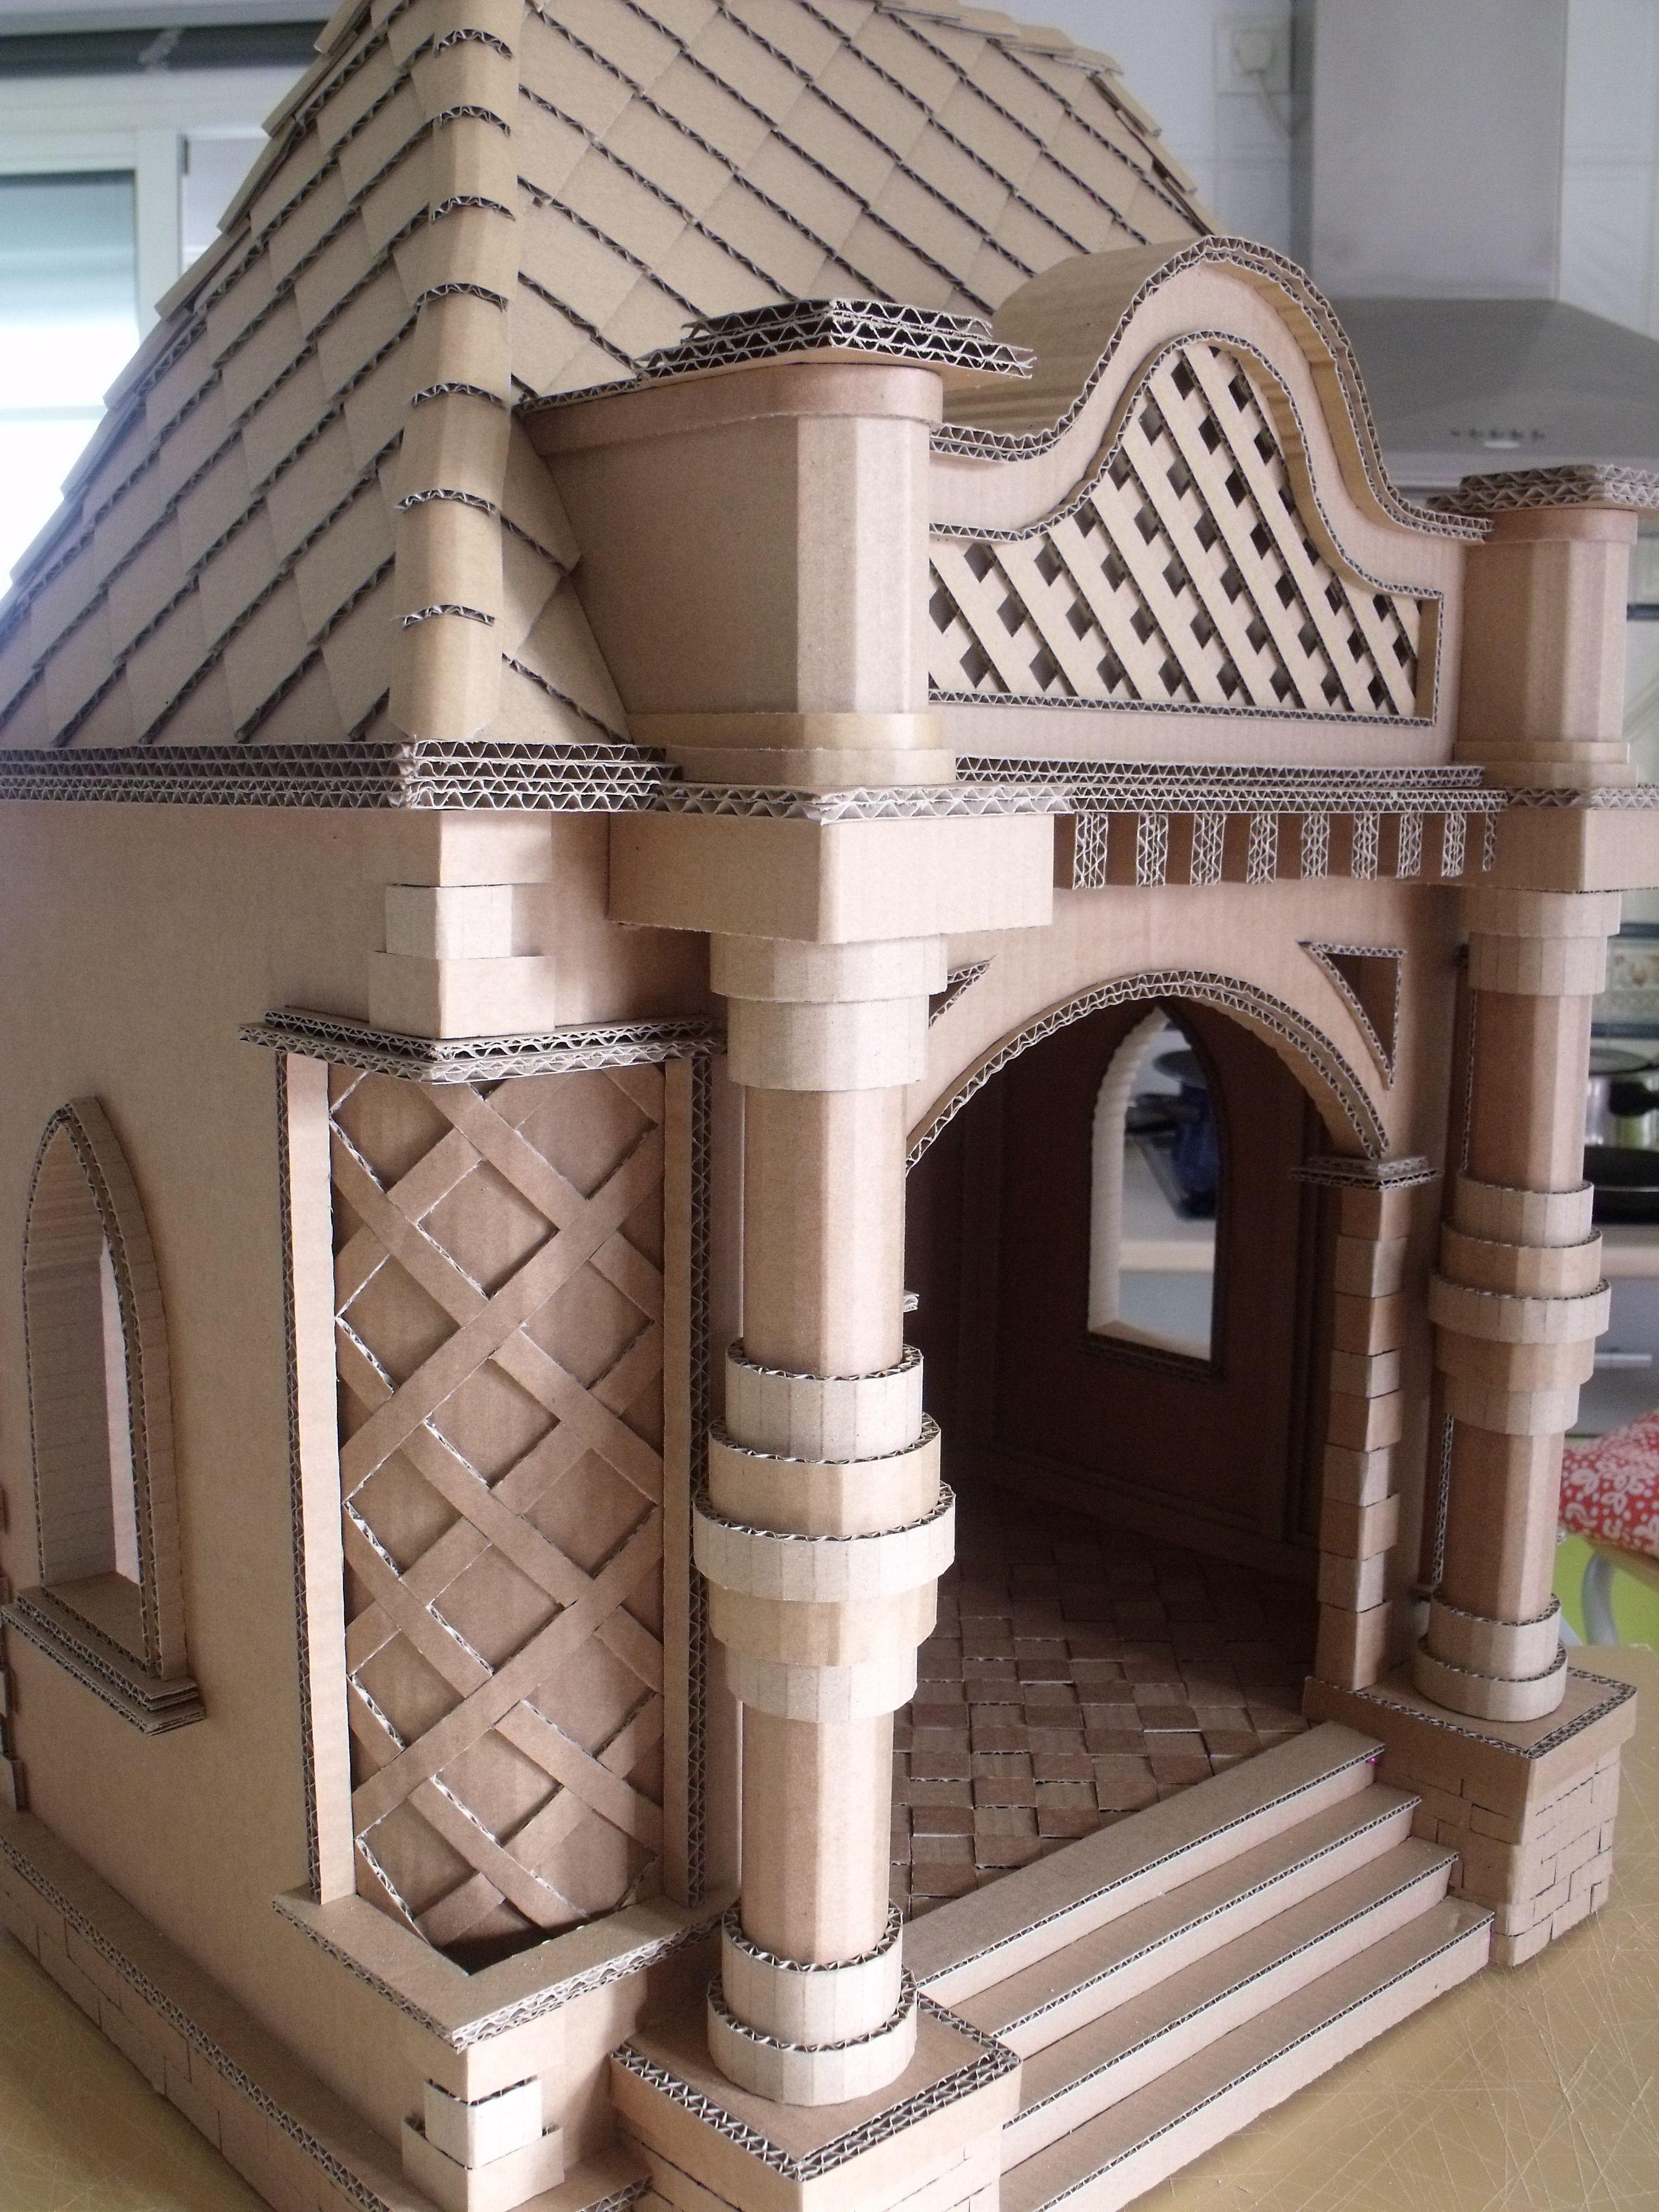 Dollhouse Or Cathouse Or Doghouse Cardboard Cat House Cool Dog